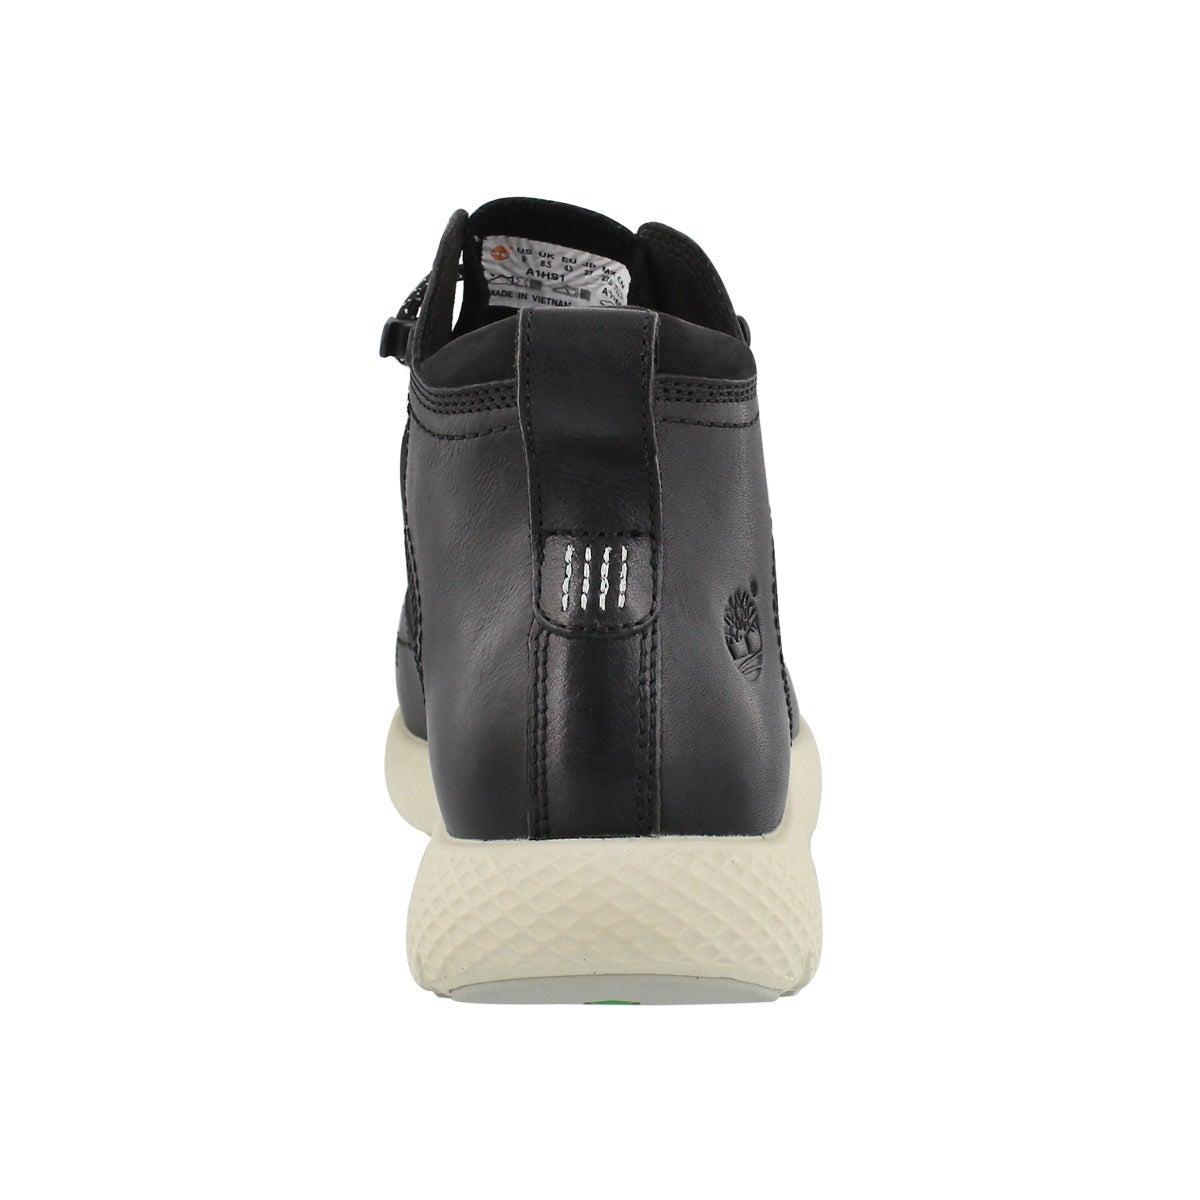 2639ae801e4 Men's FLY ROAM black hiking boots [7GgSi1302094] - $41.99